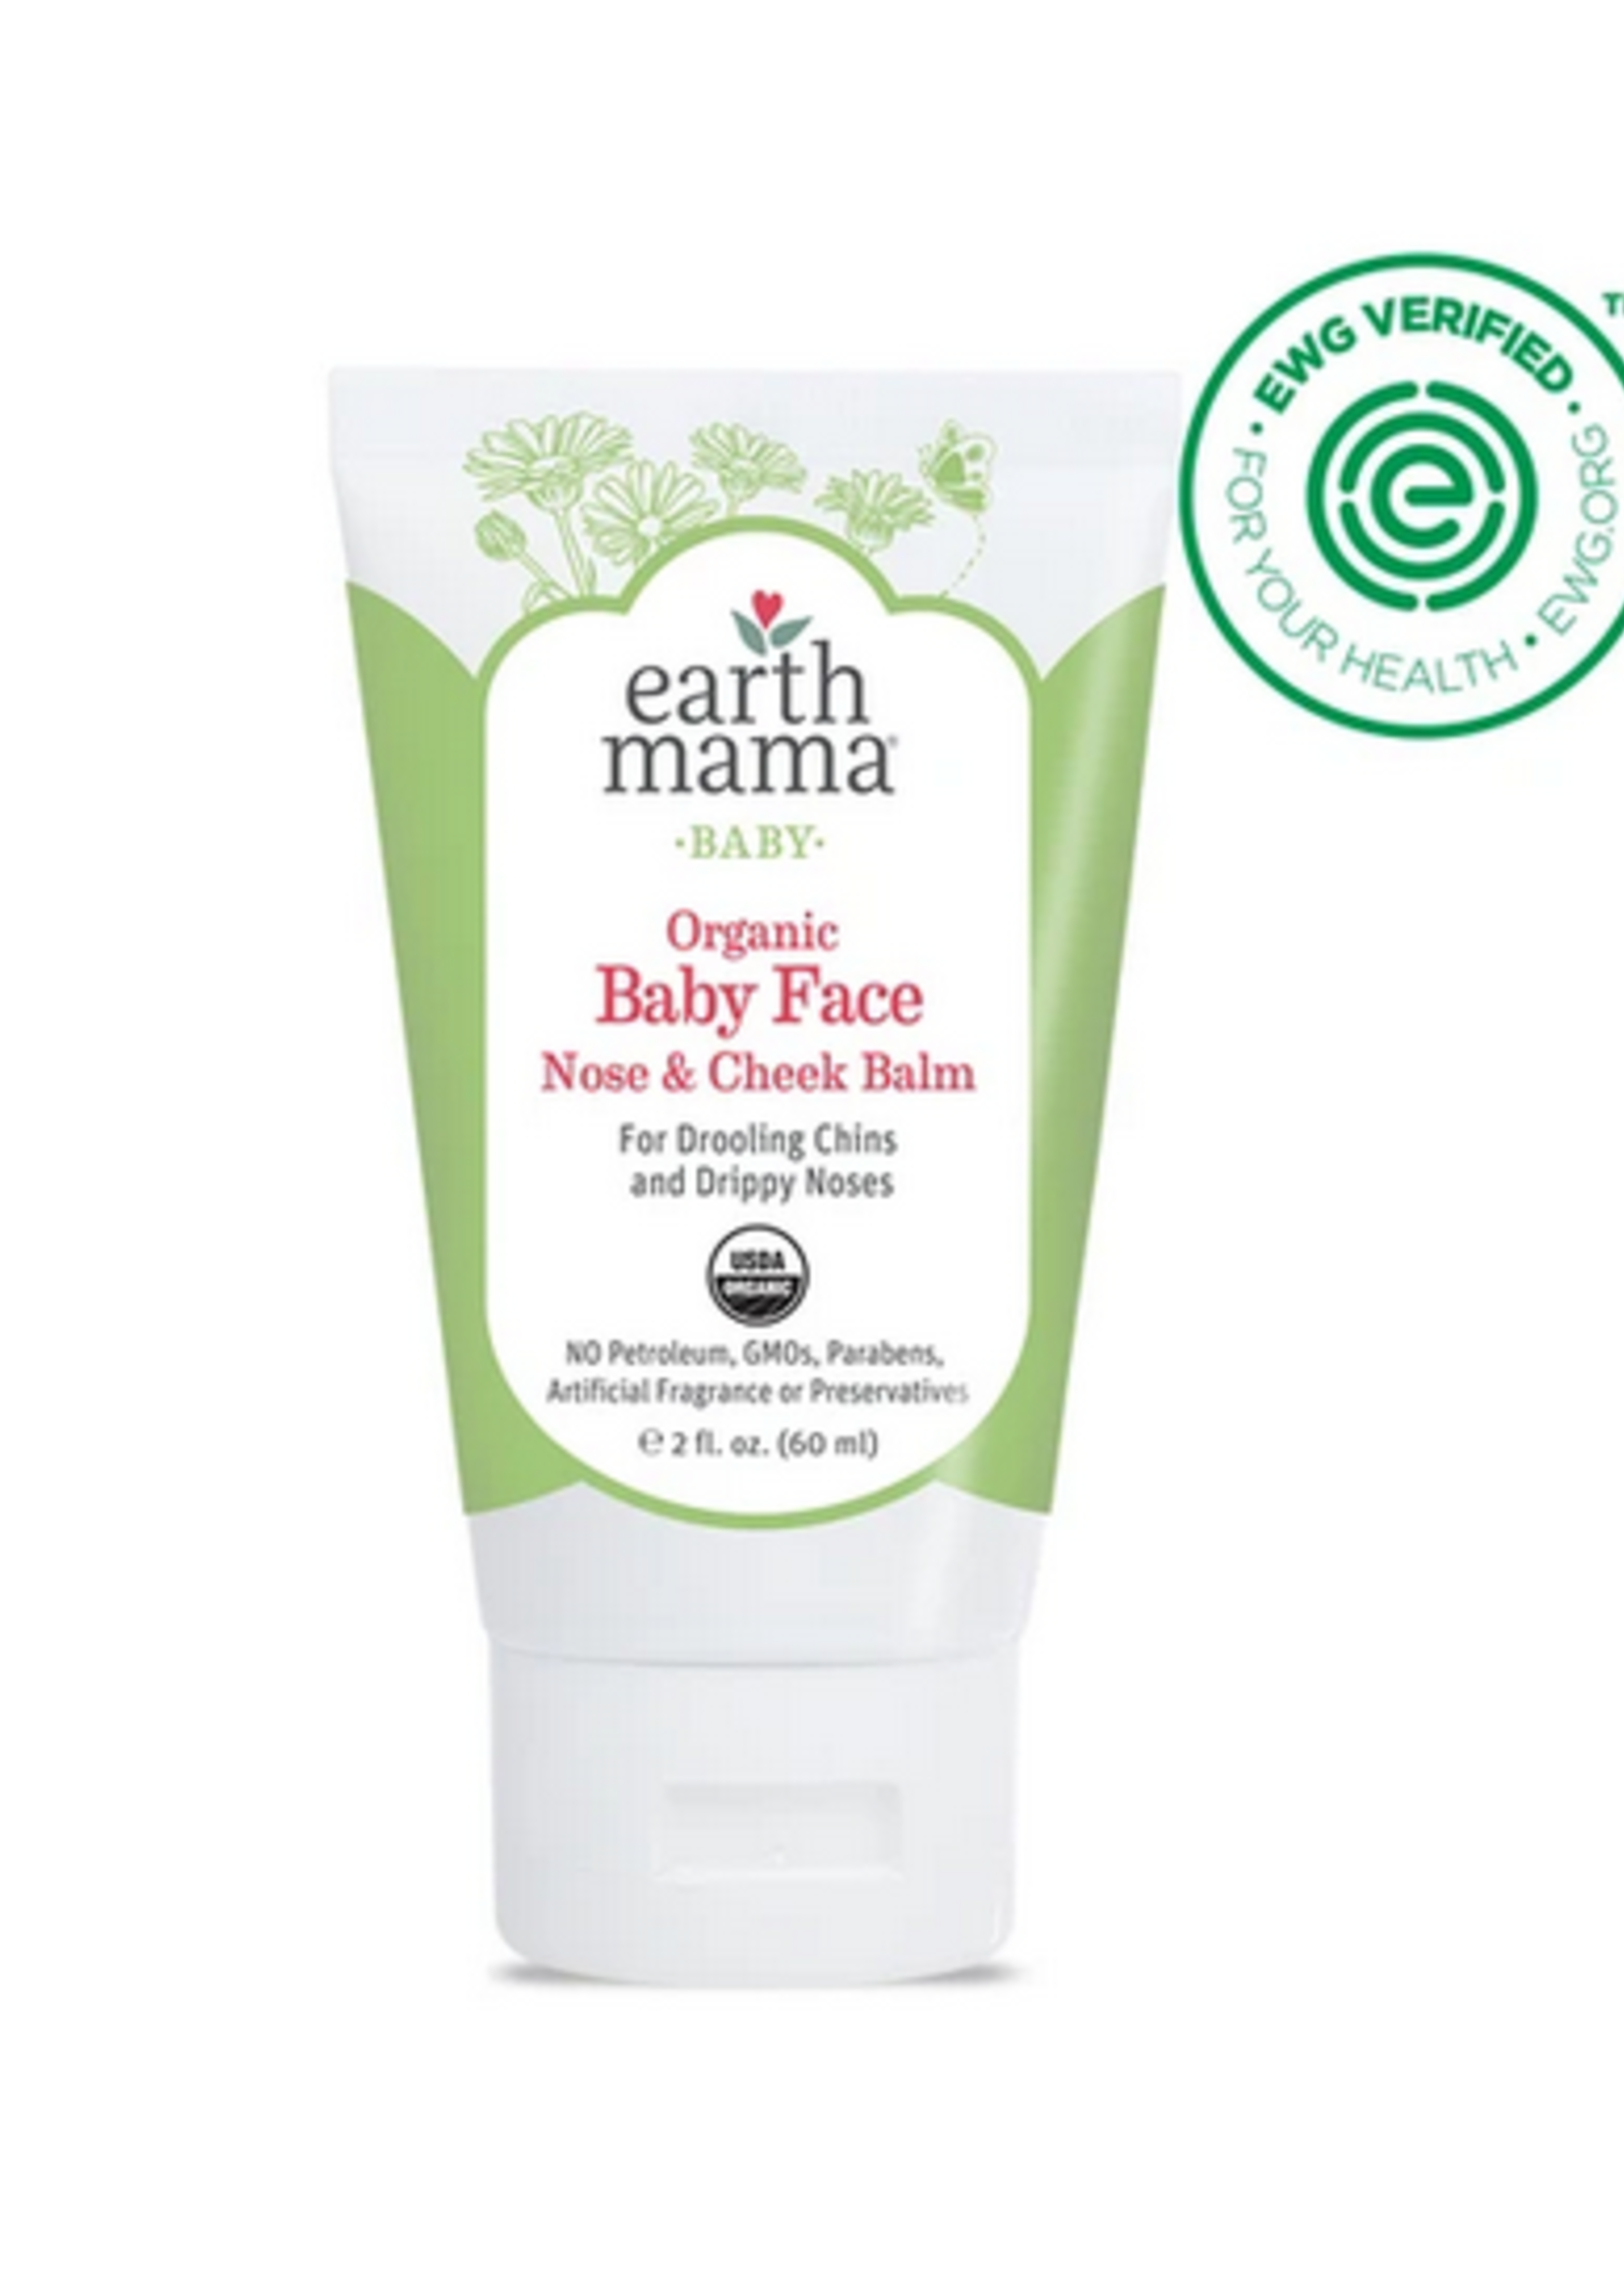 Elitaire Petite Organic Baby Face, Nose & Cheek Balm